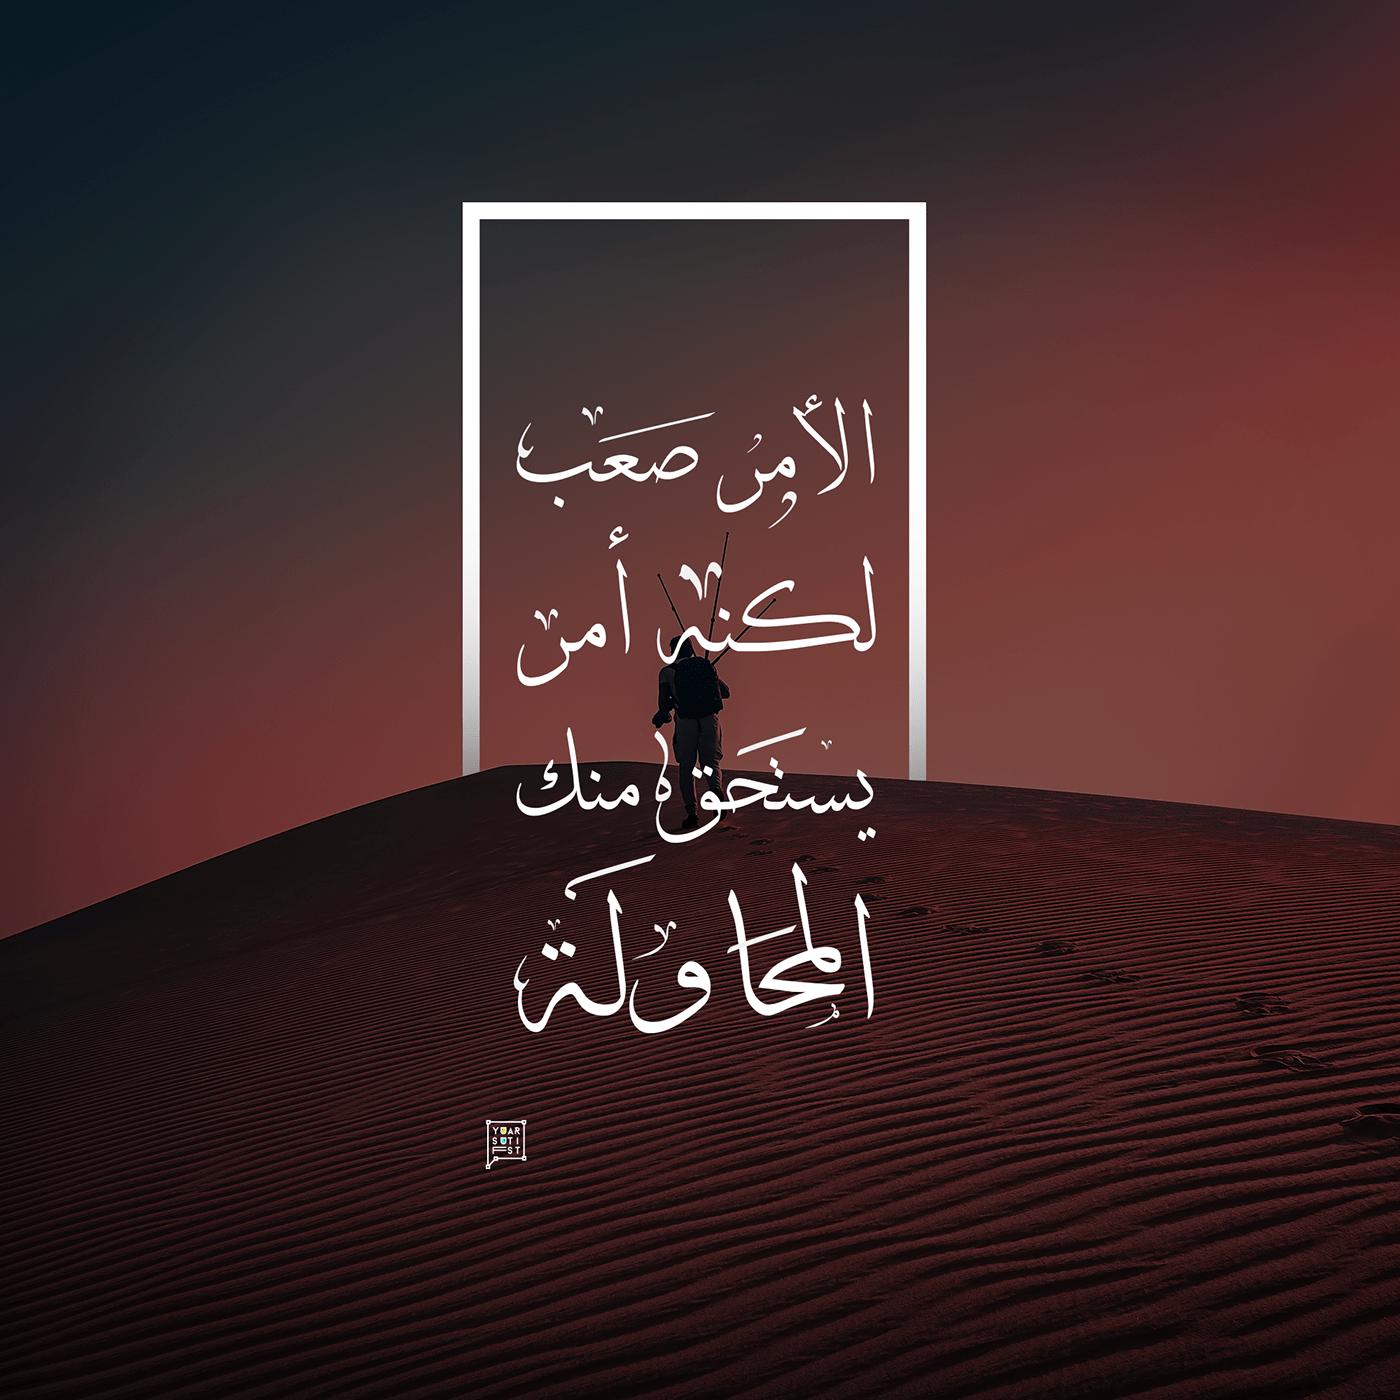 عبارات م لهمة متجدد On Behance Quotes For Book Lovers Cover Photo Quotes Funny Arabic Quotes